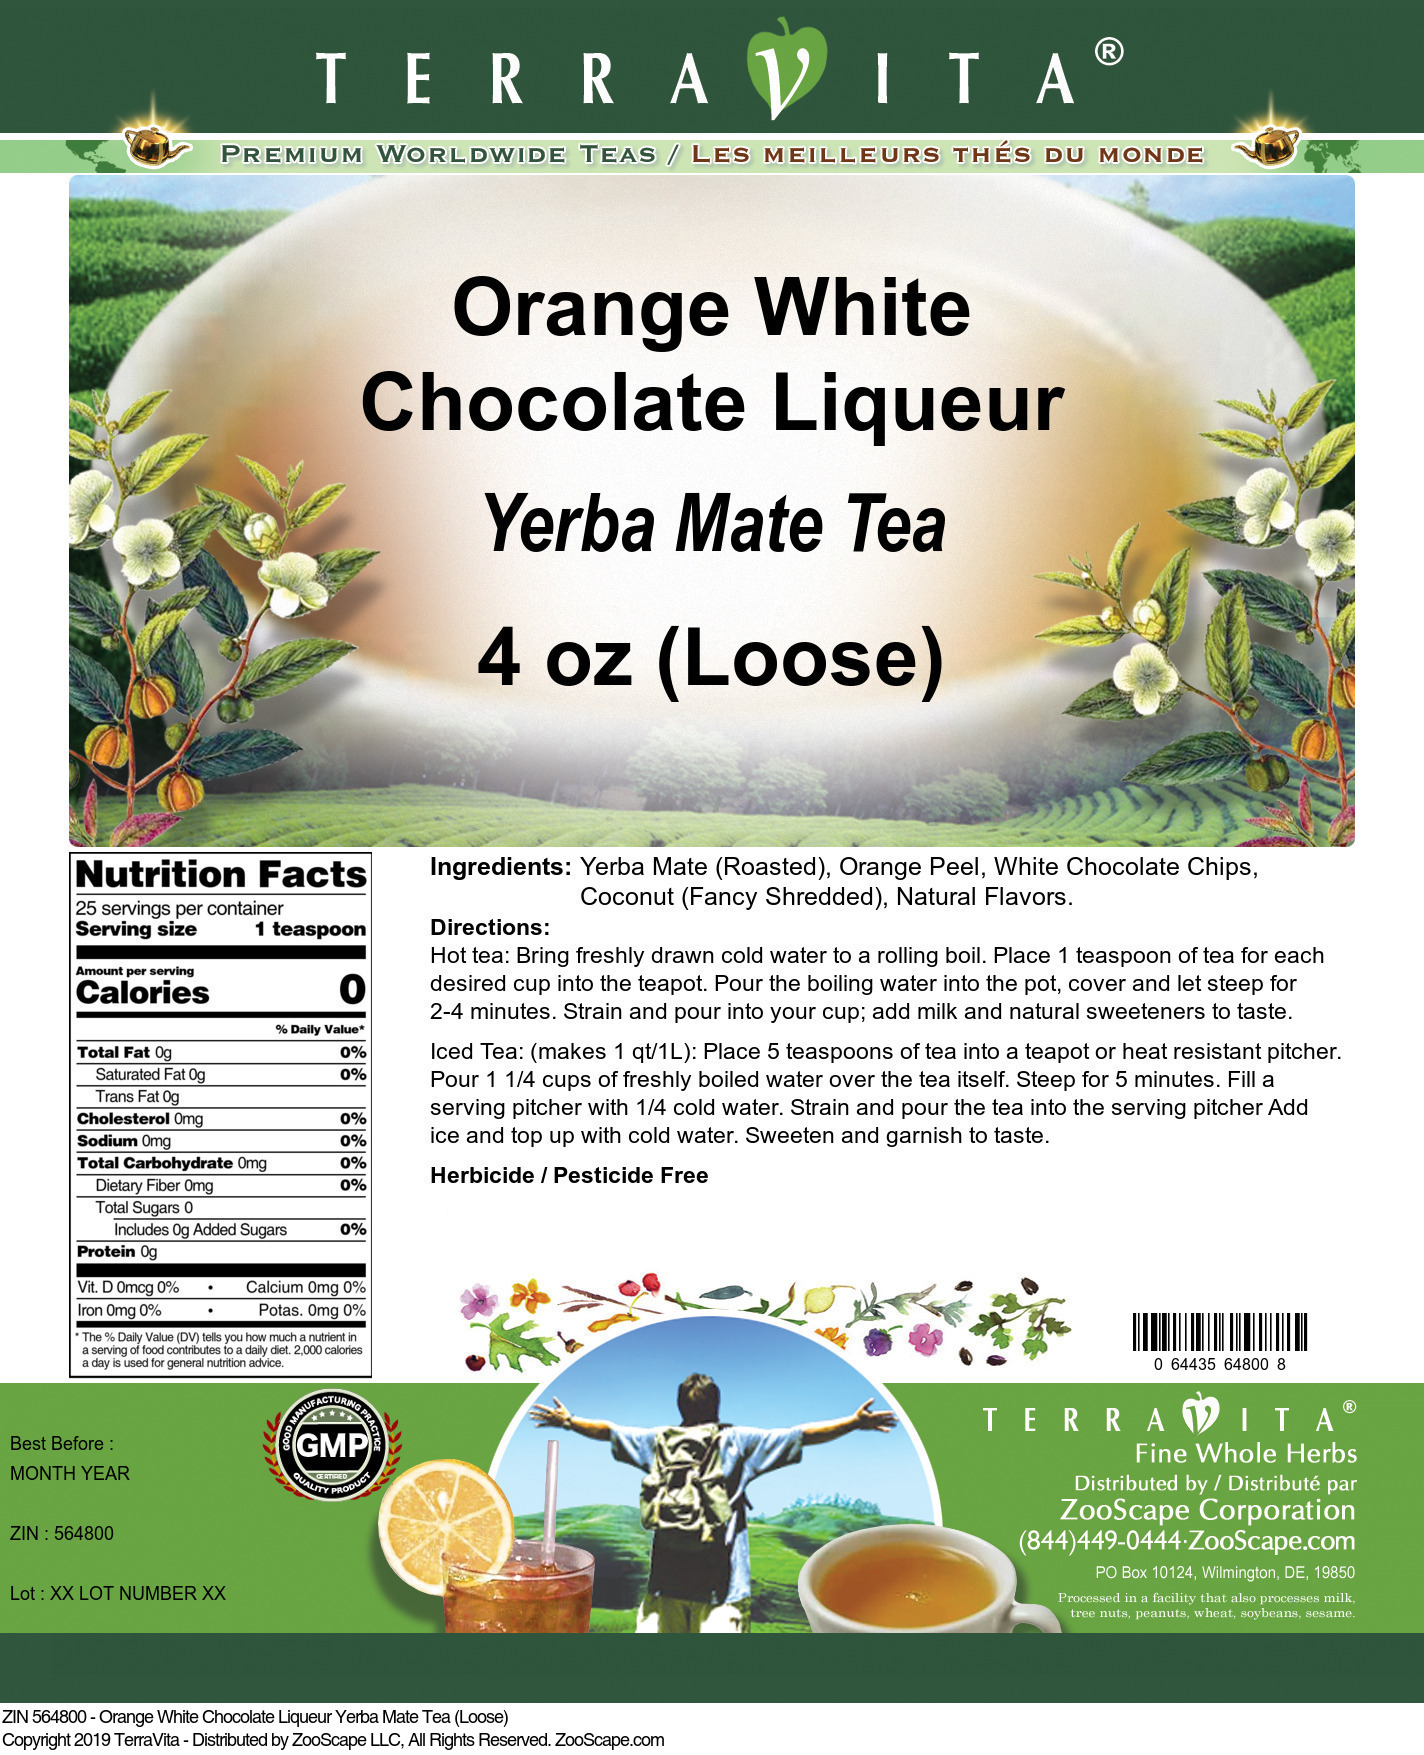 Orange White Chocolate Liqueur Yerba Mate Tea (Loose)